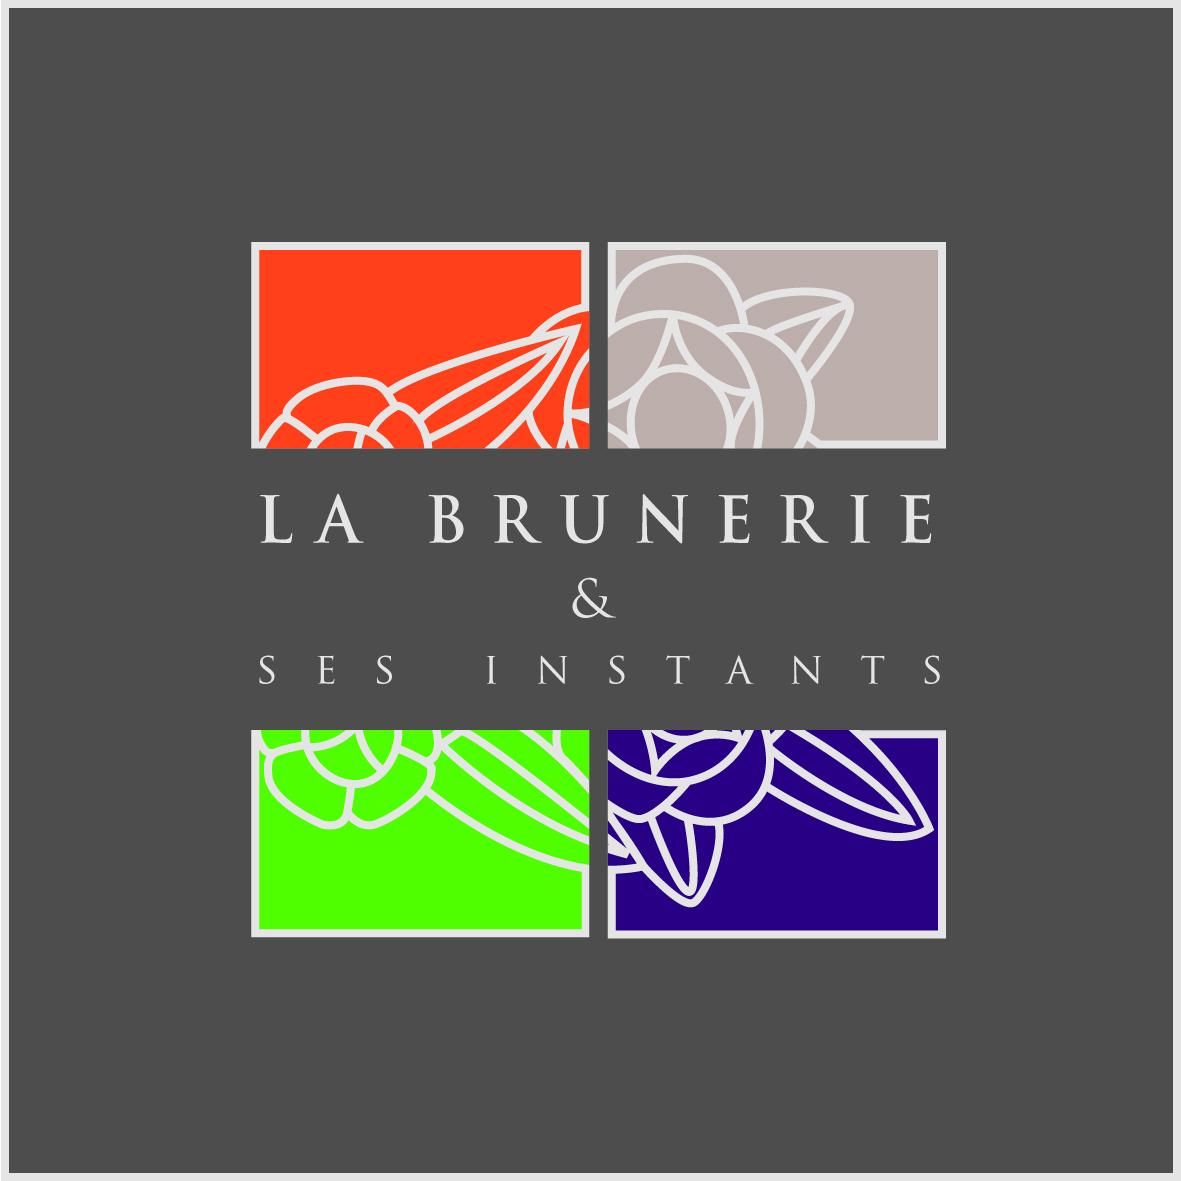 brune-logo-brun.jpg